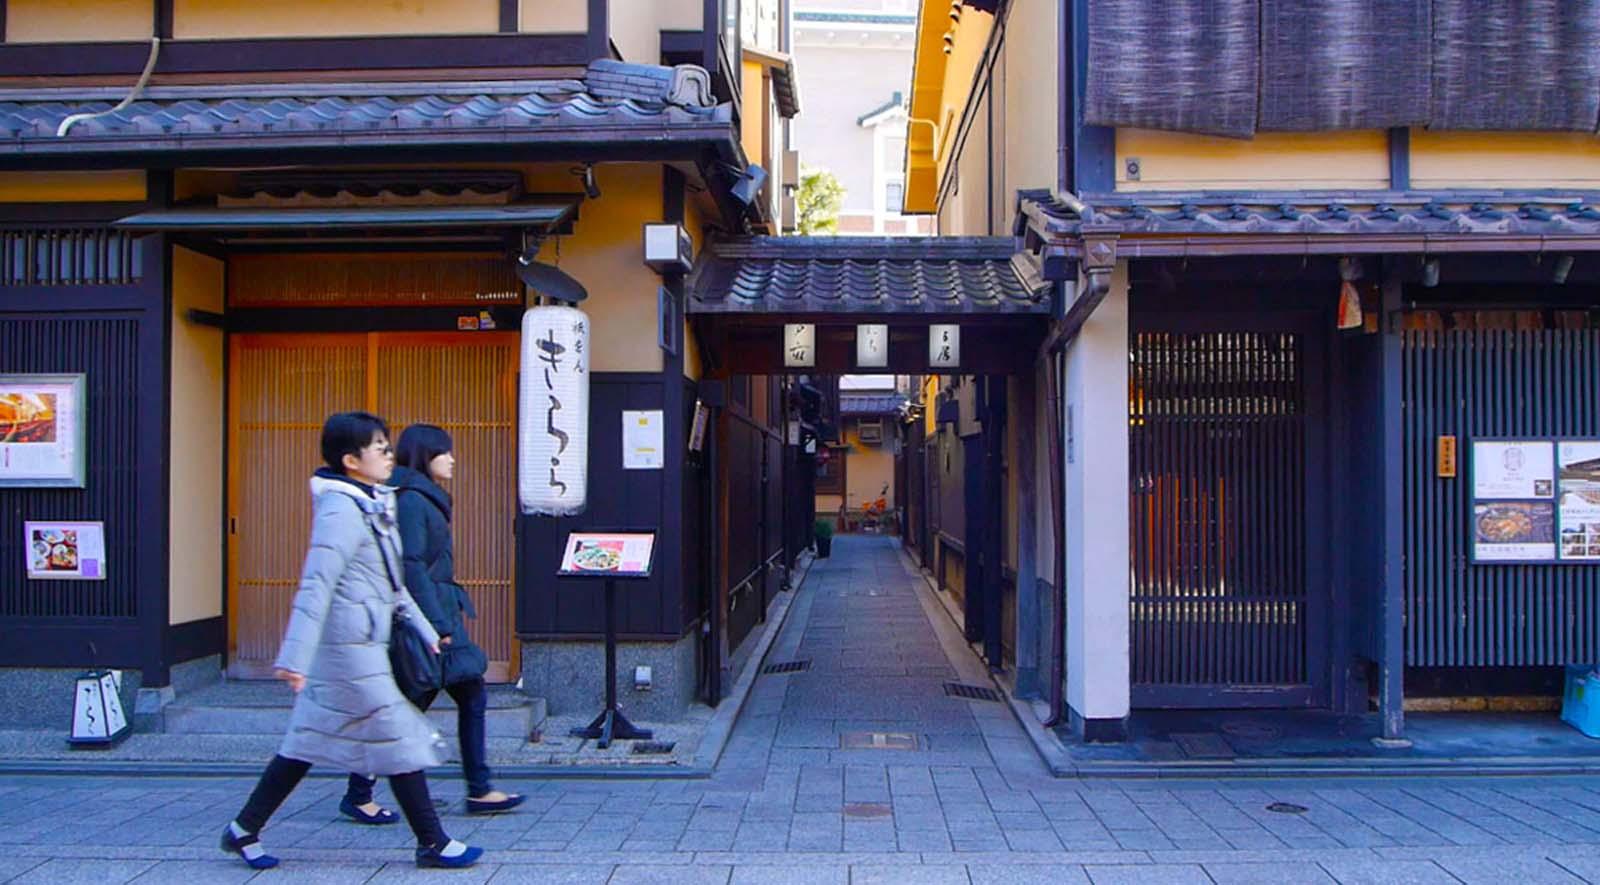 IN the heart of Kyoto - Explore the area around Machiya Maya Gion